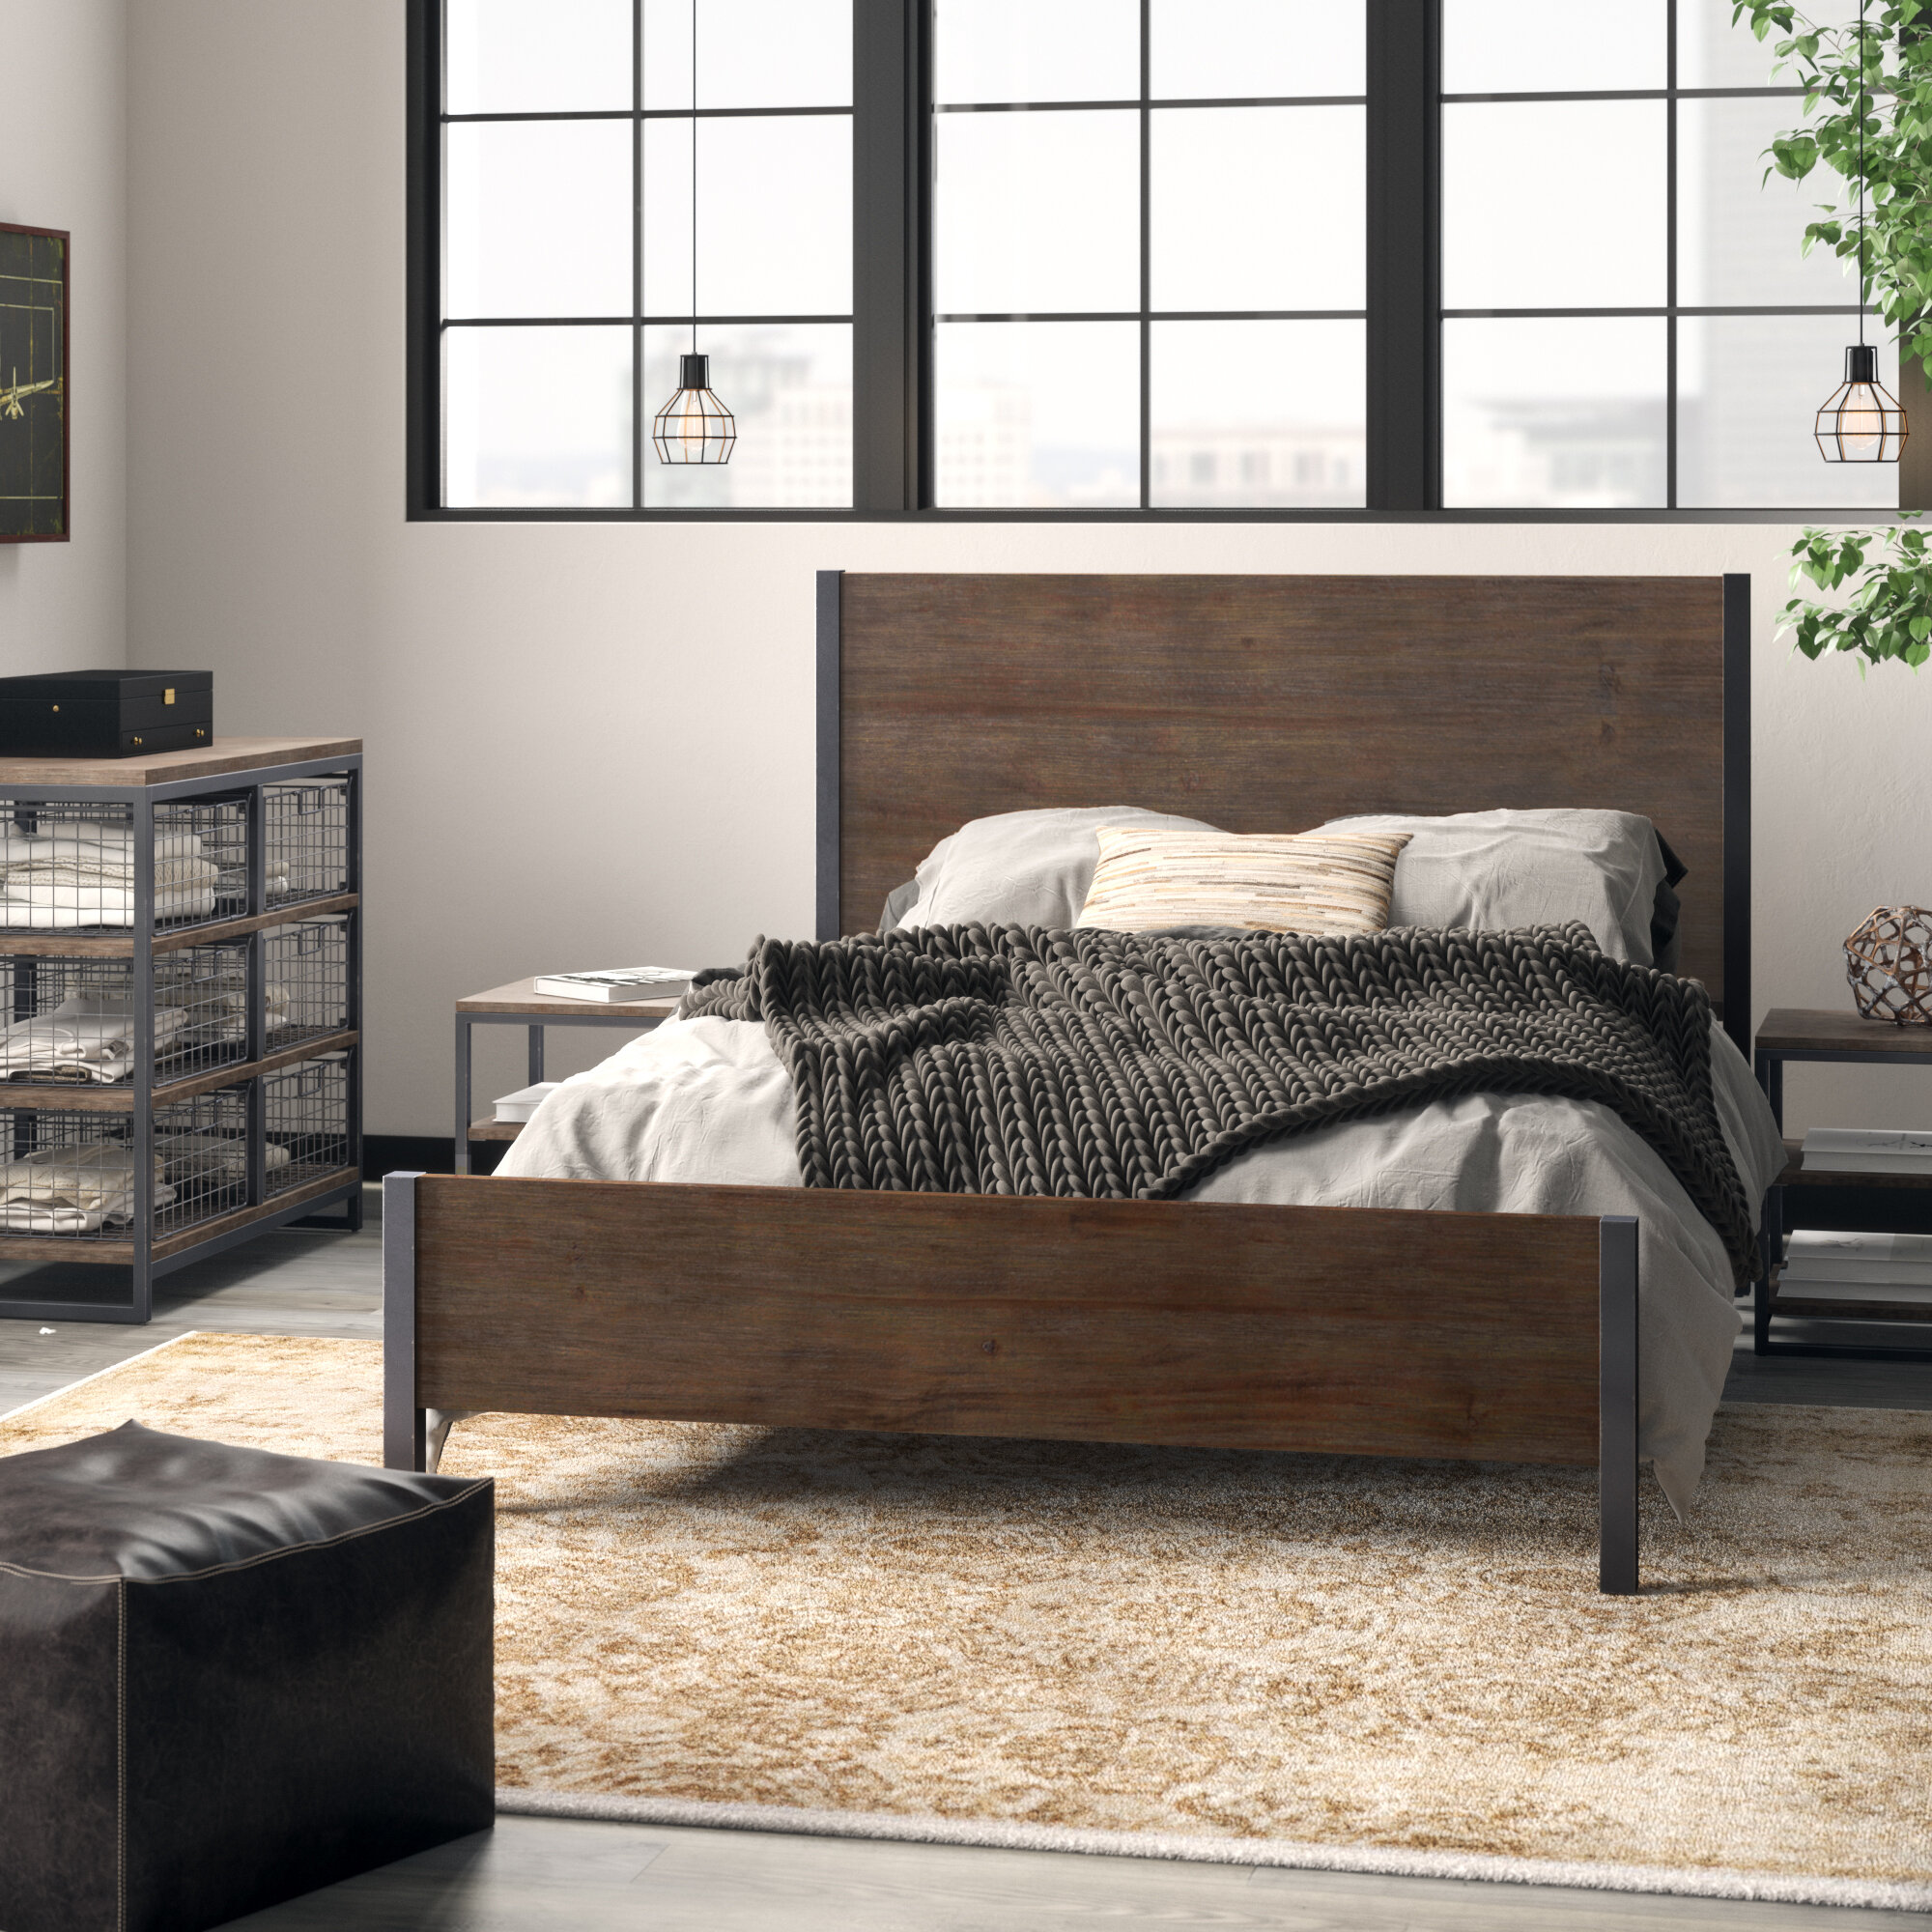 Moriann Standard 4 Piece Bedroom Set